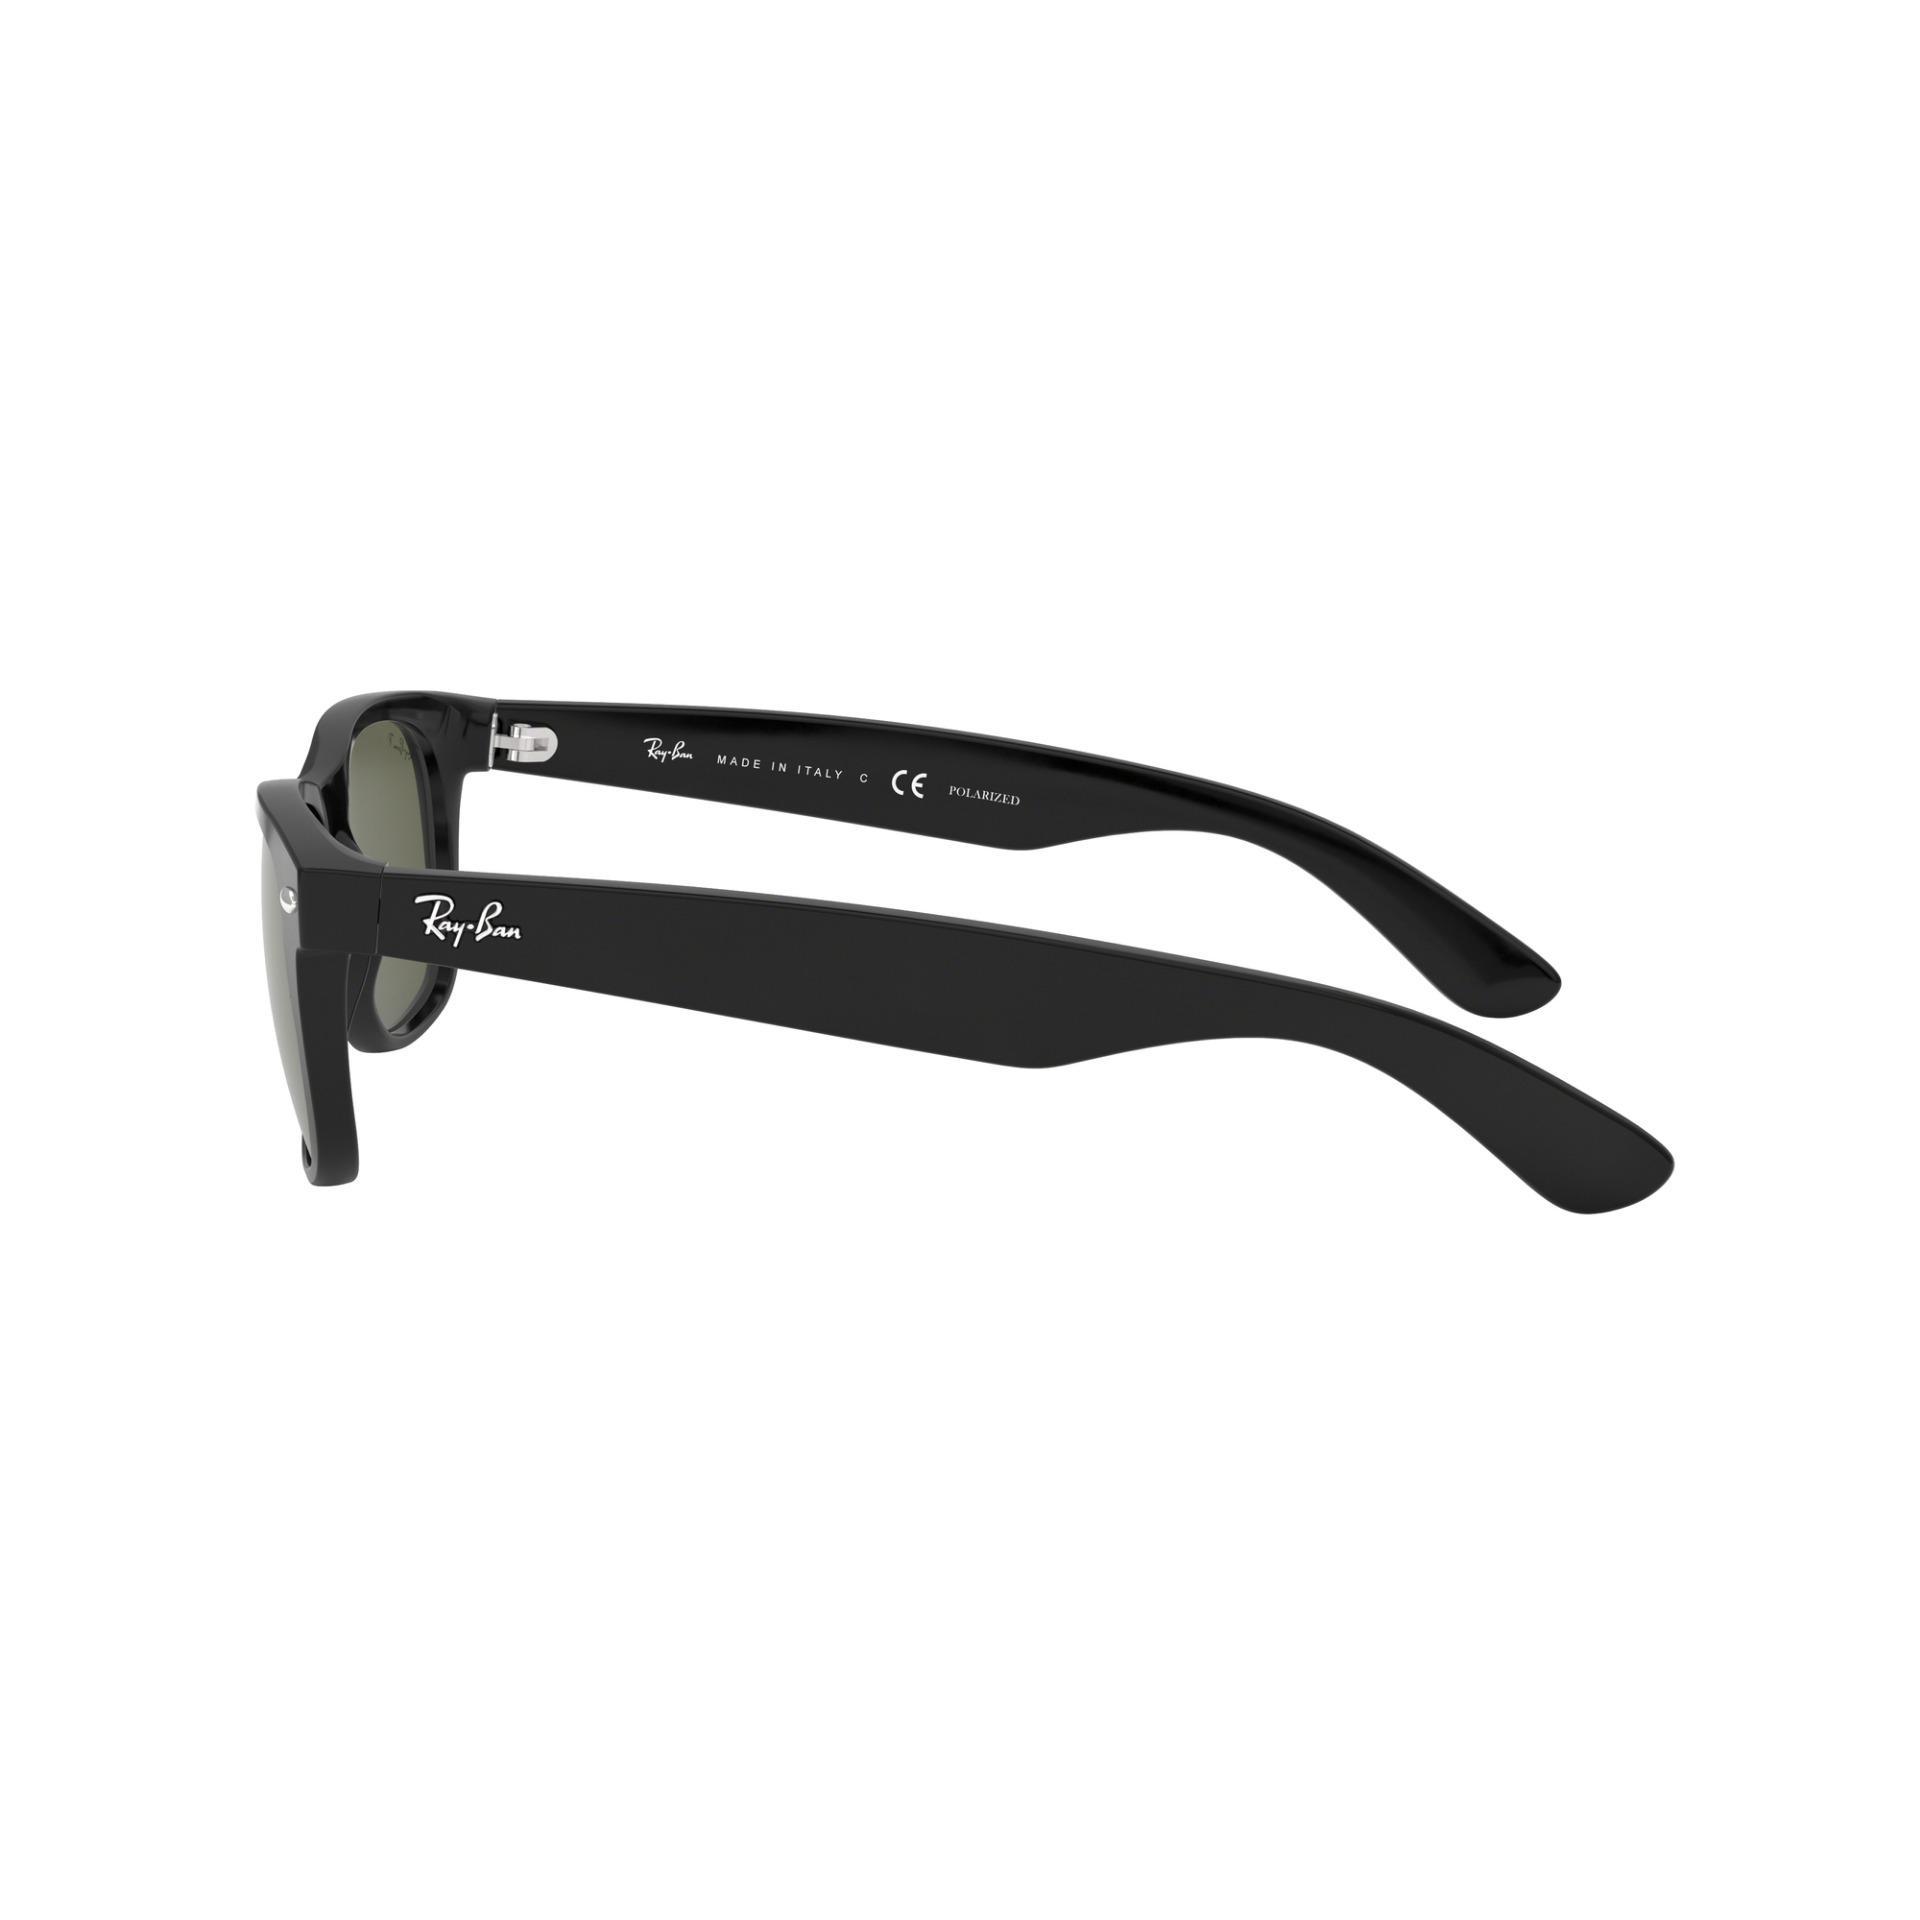 437d1ea2e9110 Ray-Ban New Wayfarer Polarized - RB2132F 901 58 - Sunglasses